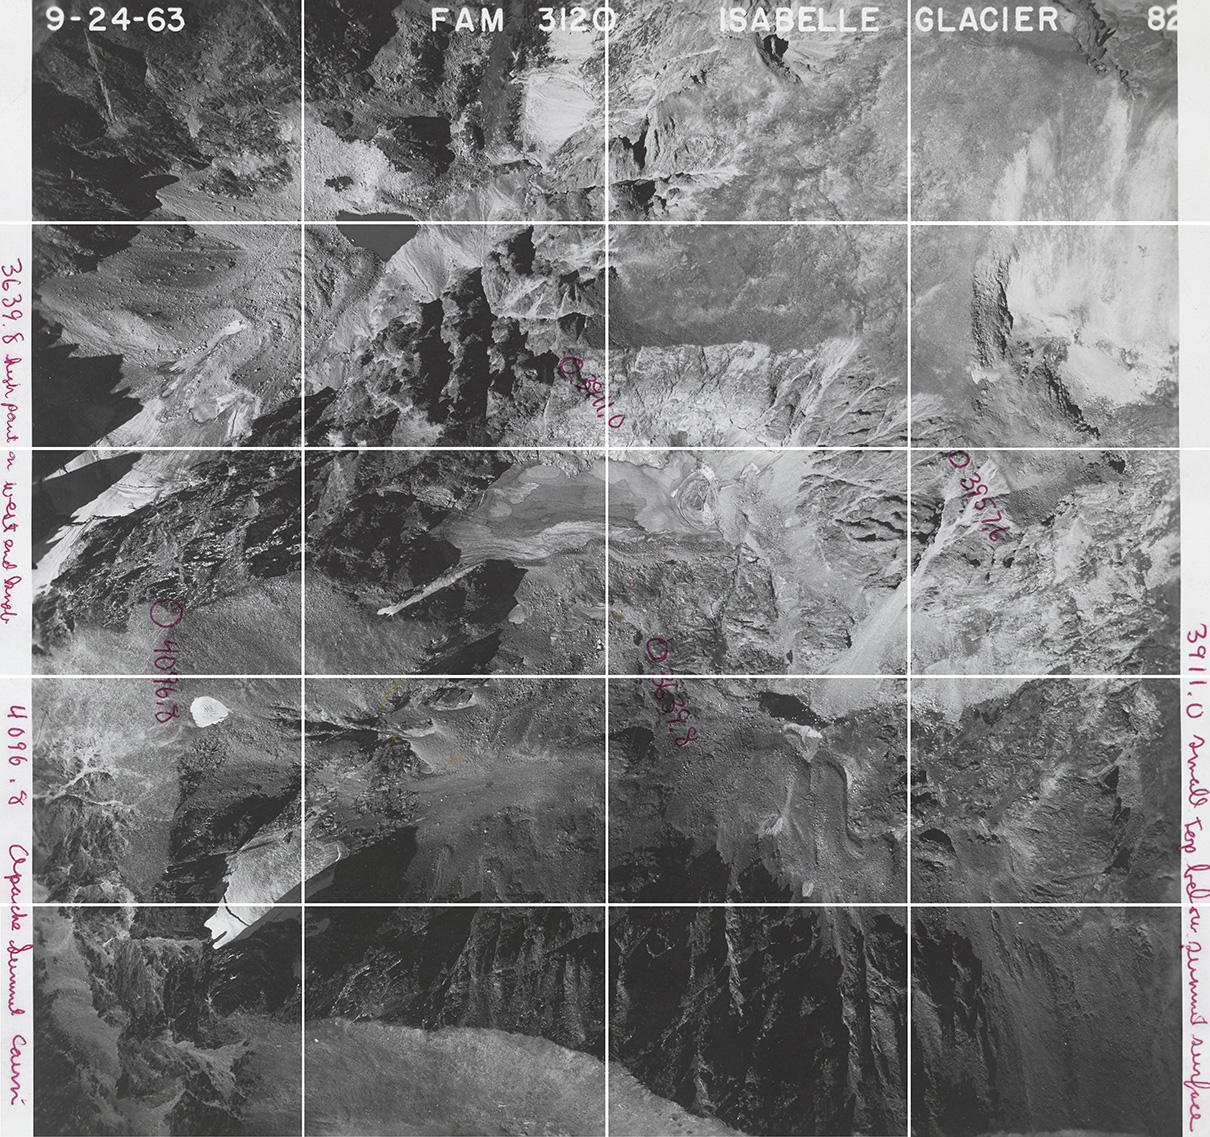 AGS_1963_FAM3120_Grid.jpg